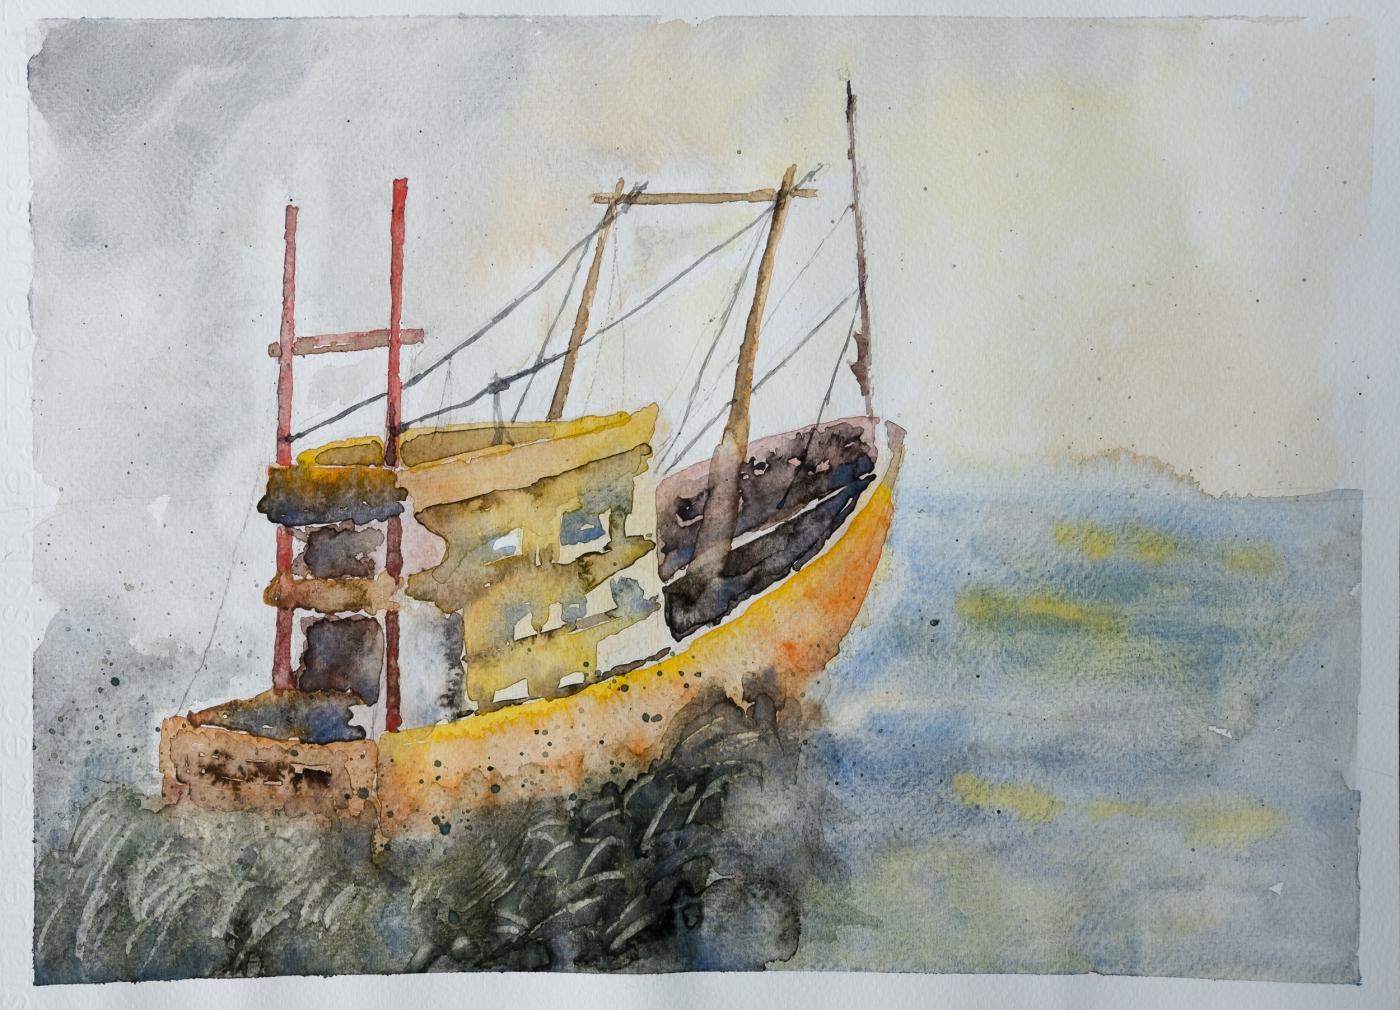 #WorldWatercolorGroup Watercolor painting by Daniel Trump of boat on water - #doodlewash